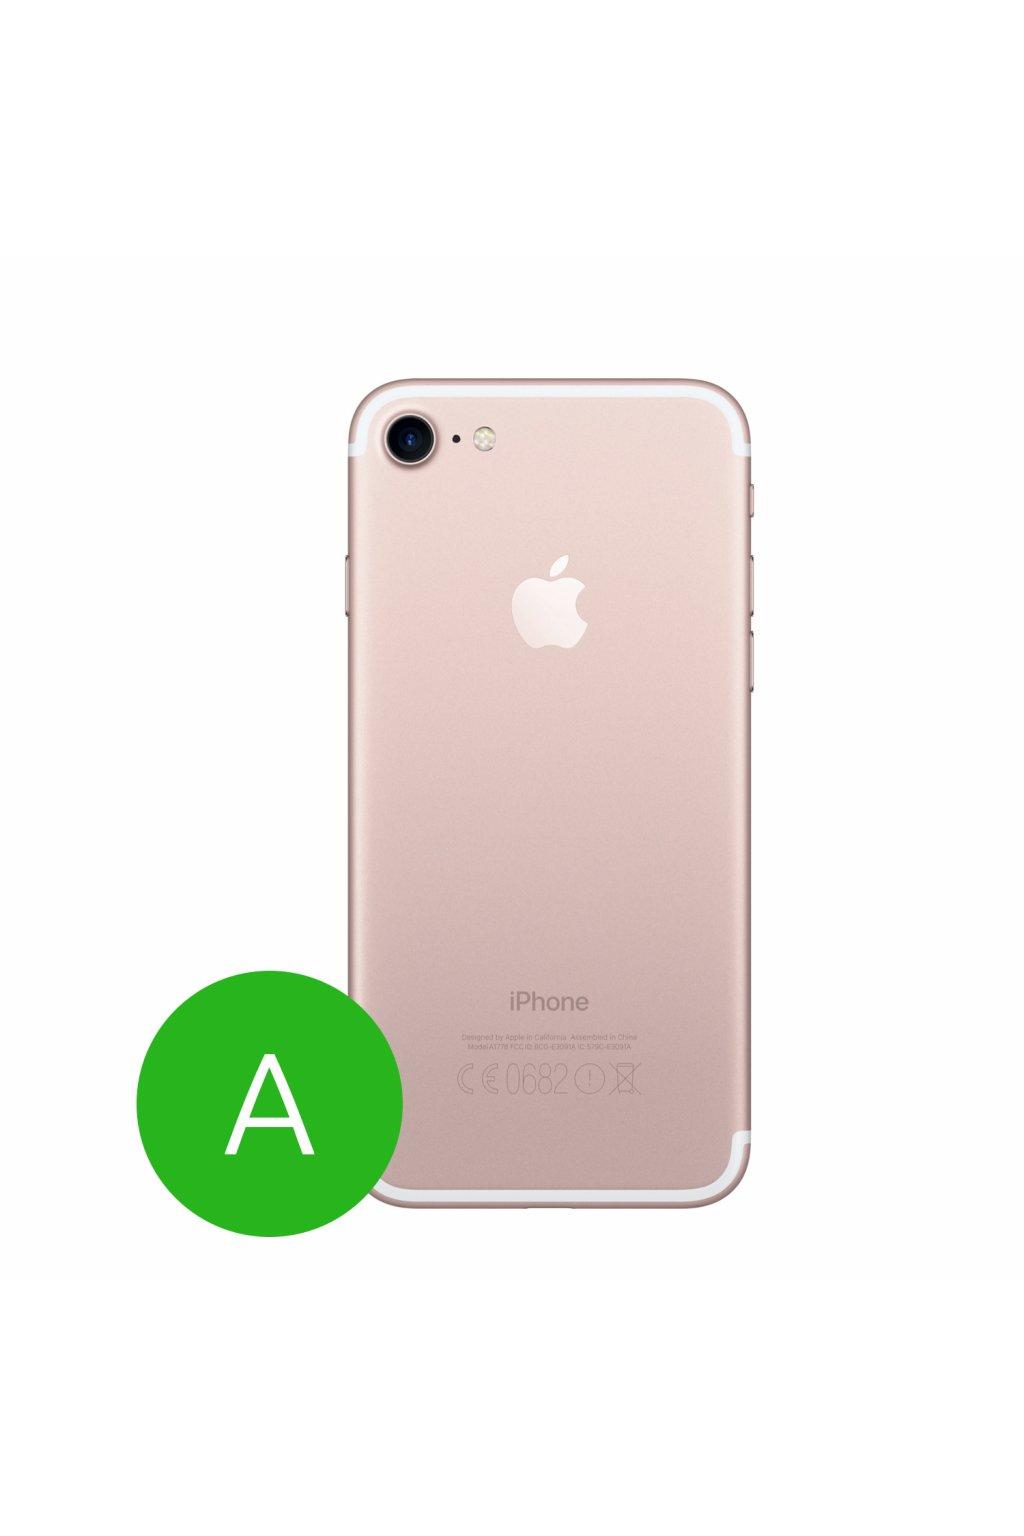 iPhone7 rosegold A